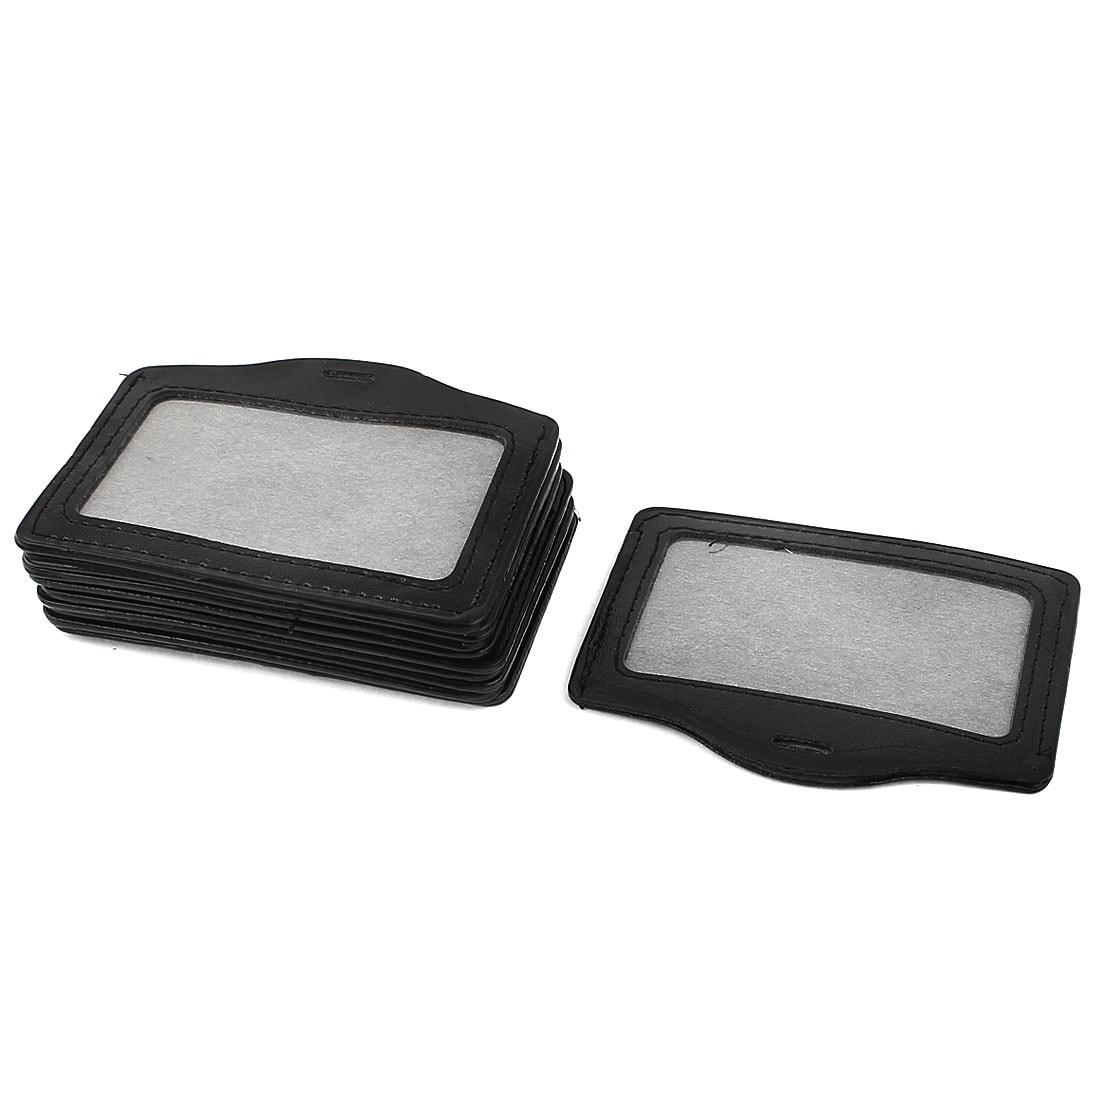 10Pcs Business ID Card Badge Holder Genuine leather Horizontal or Vertical Black